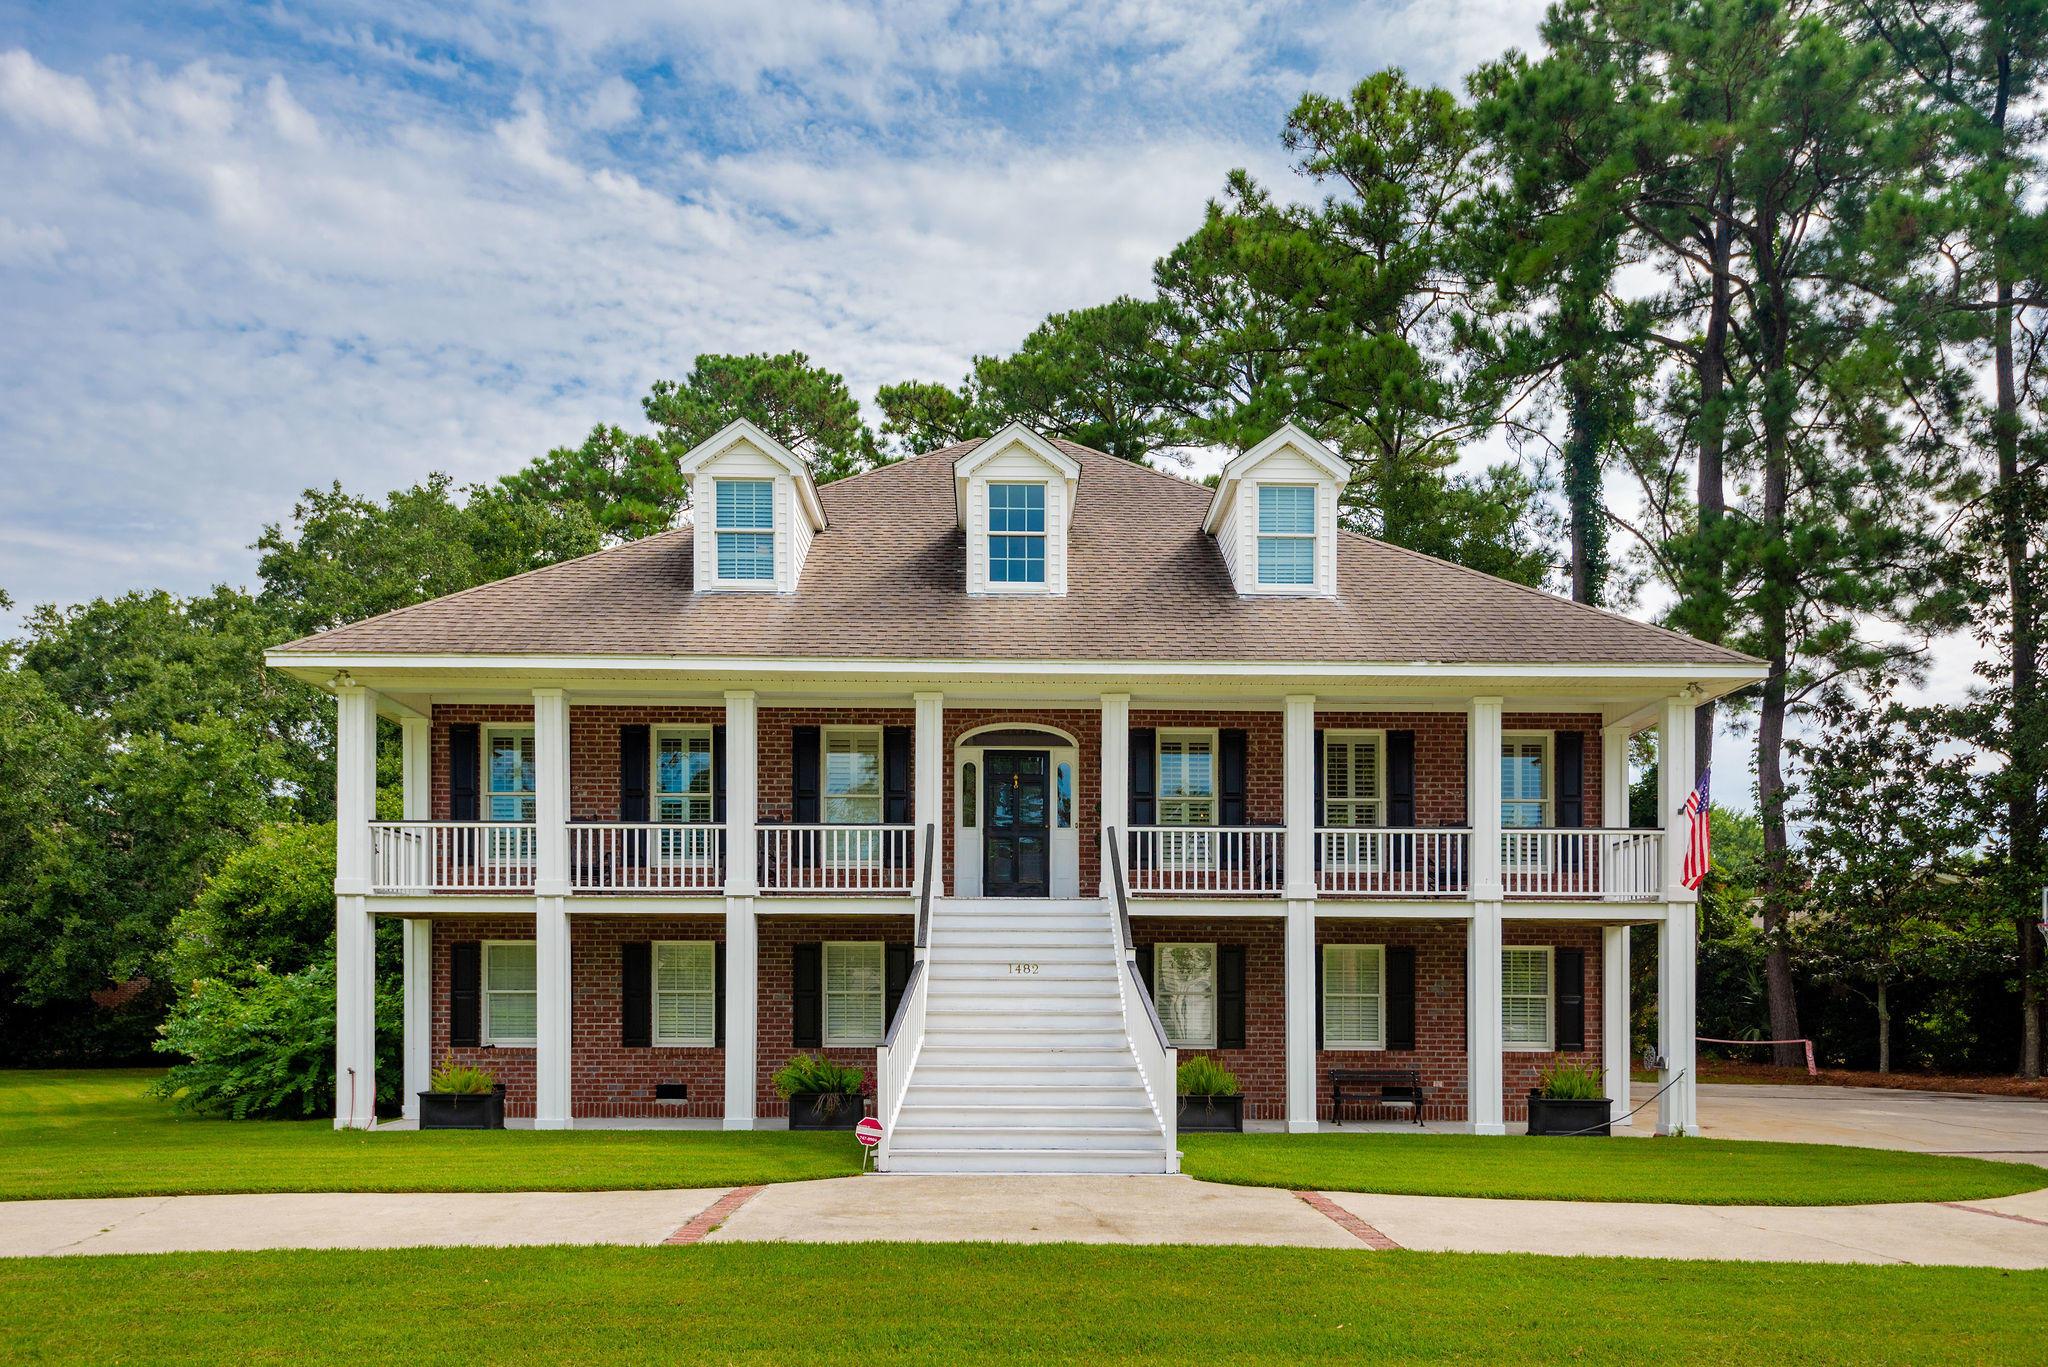 Country Club II Homes For Sale - 1482 Burningtree, Charleston, SC - 61